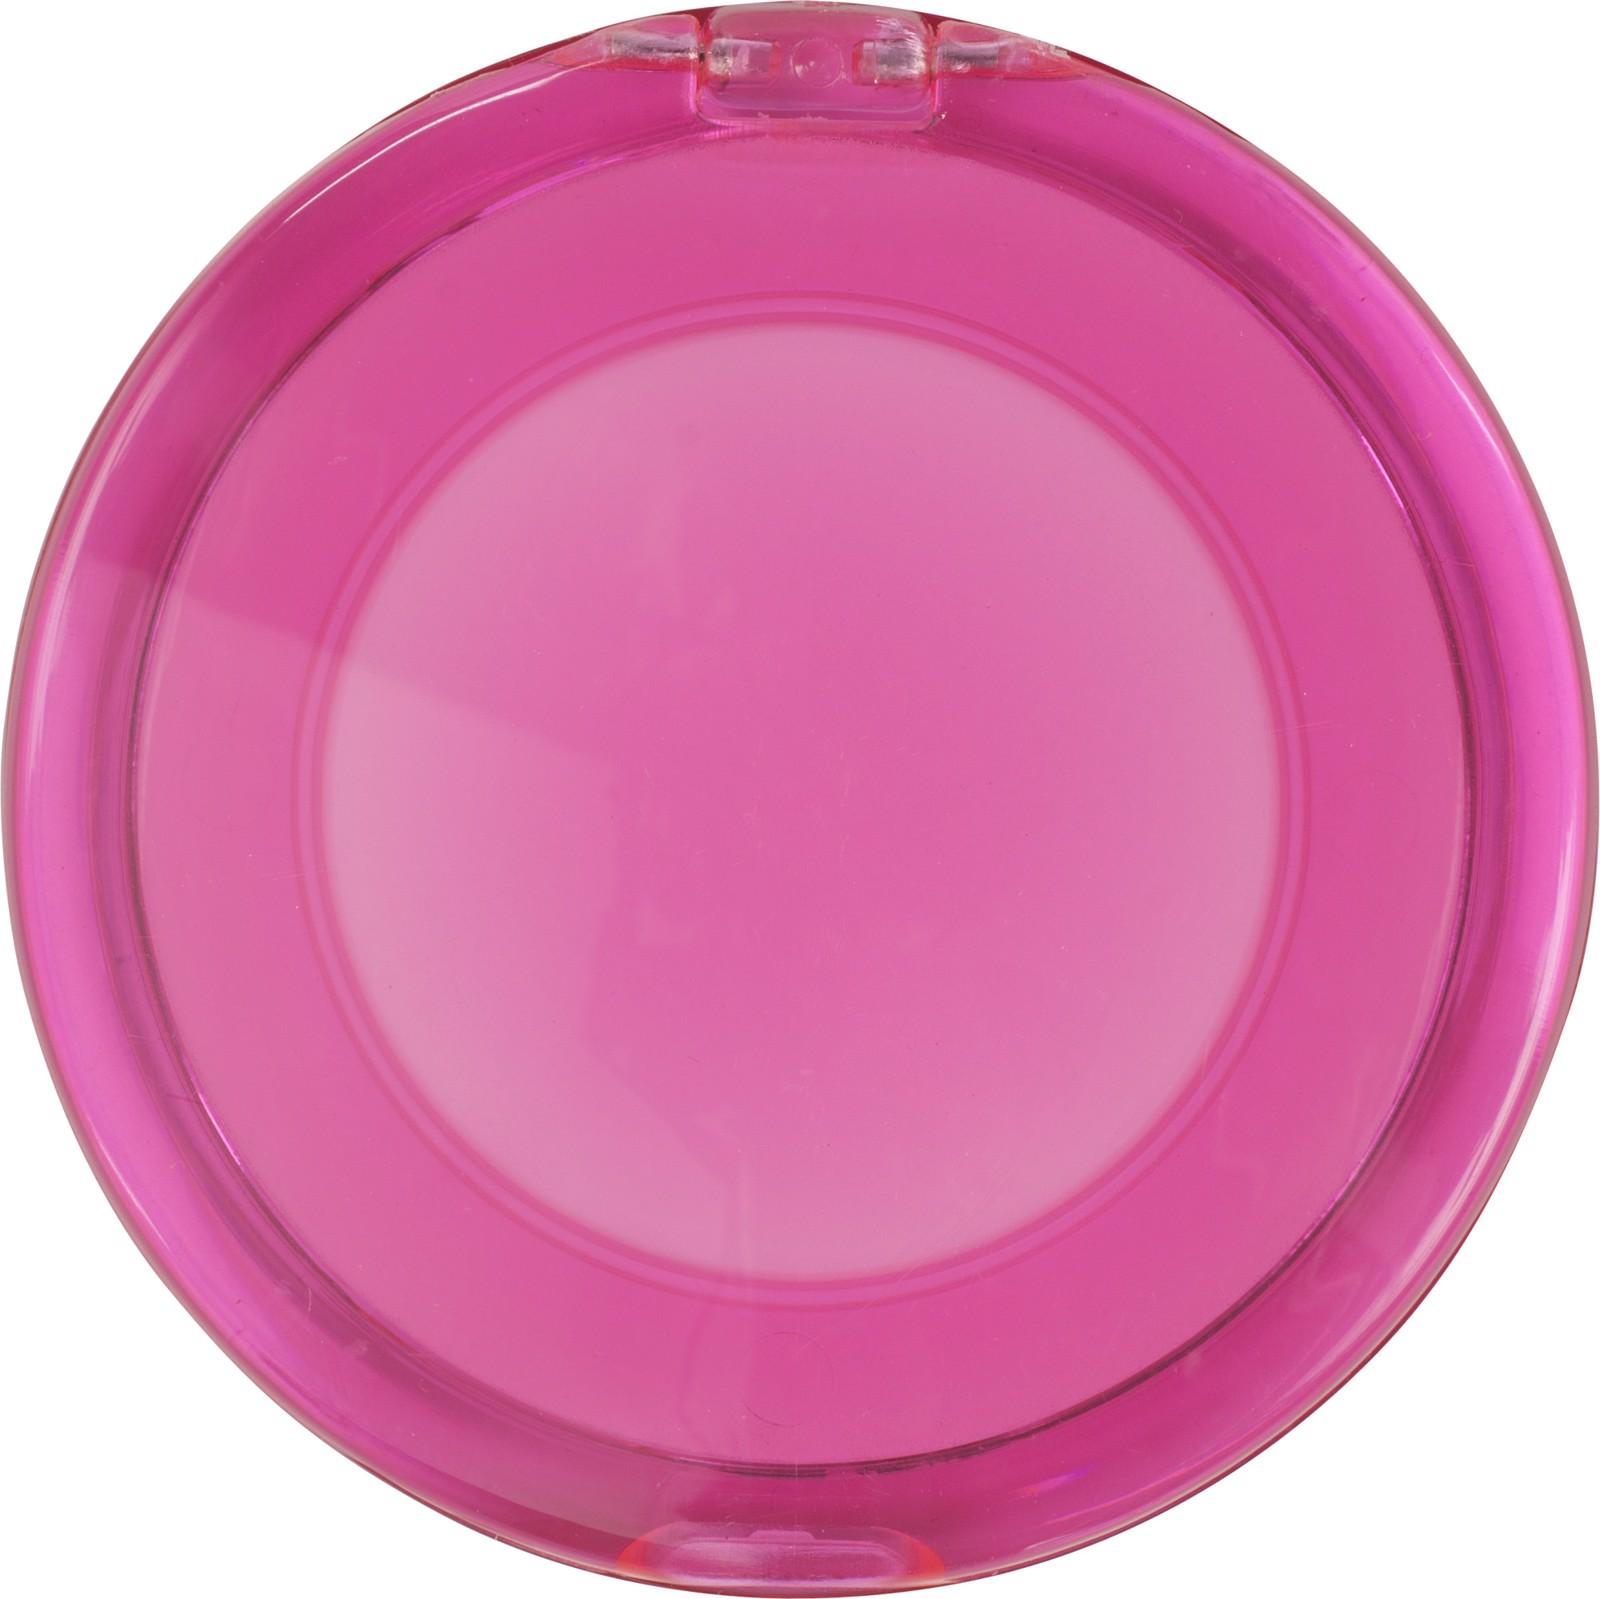 PS pocket mirror - Pink